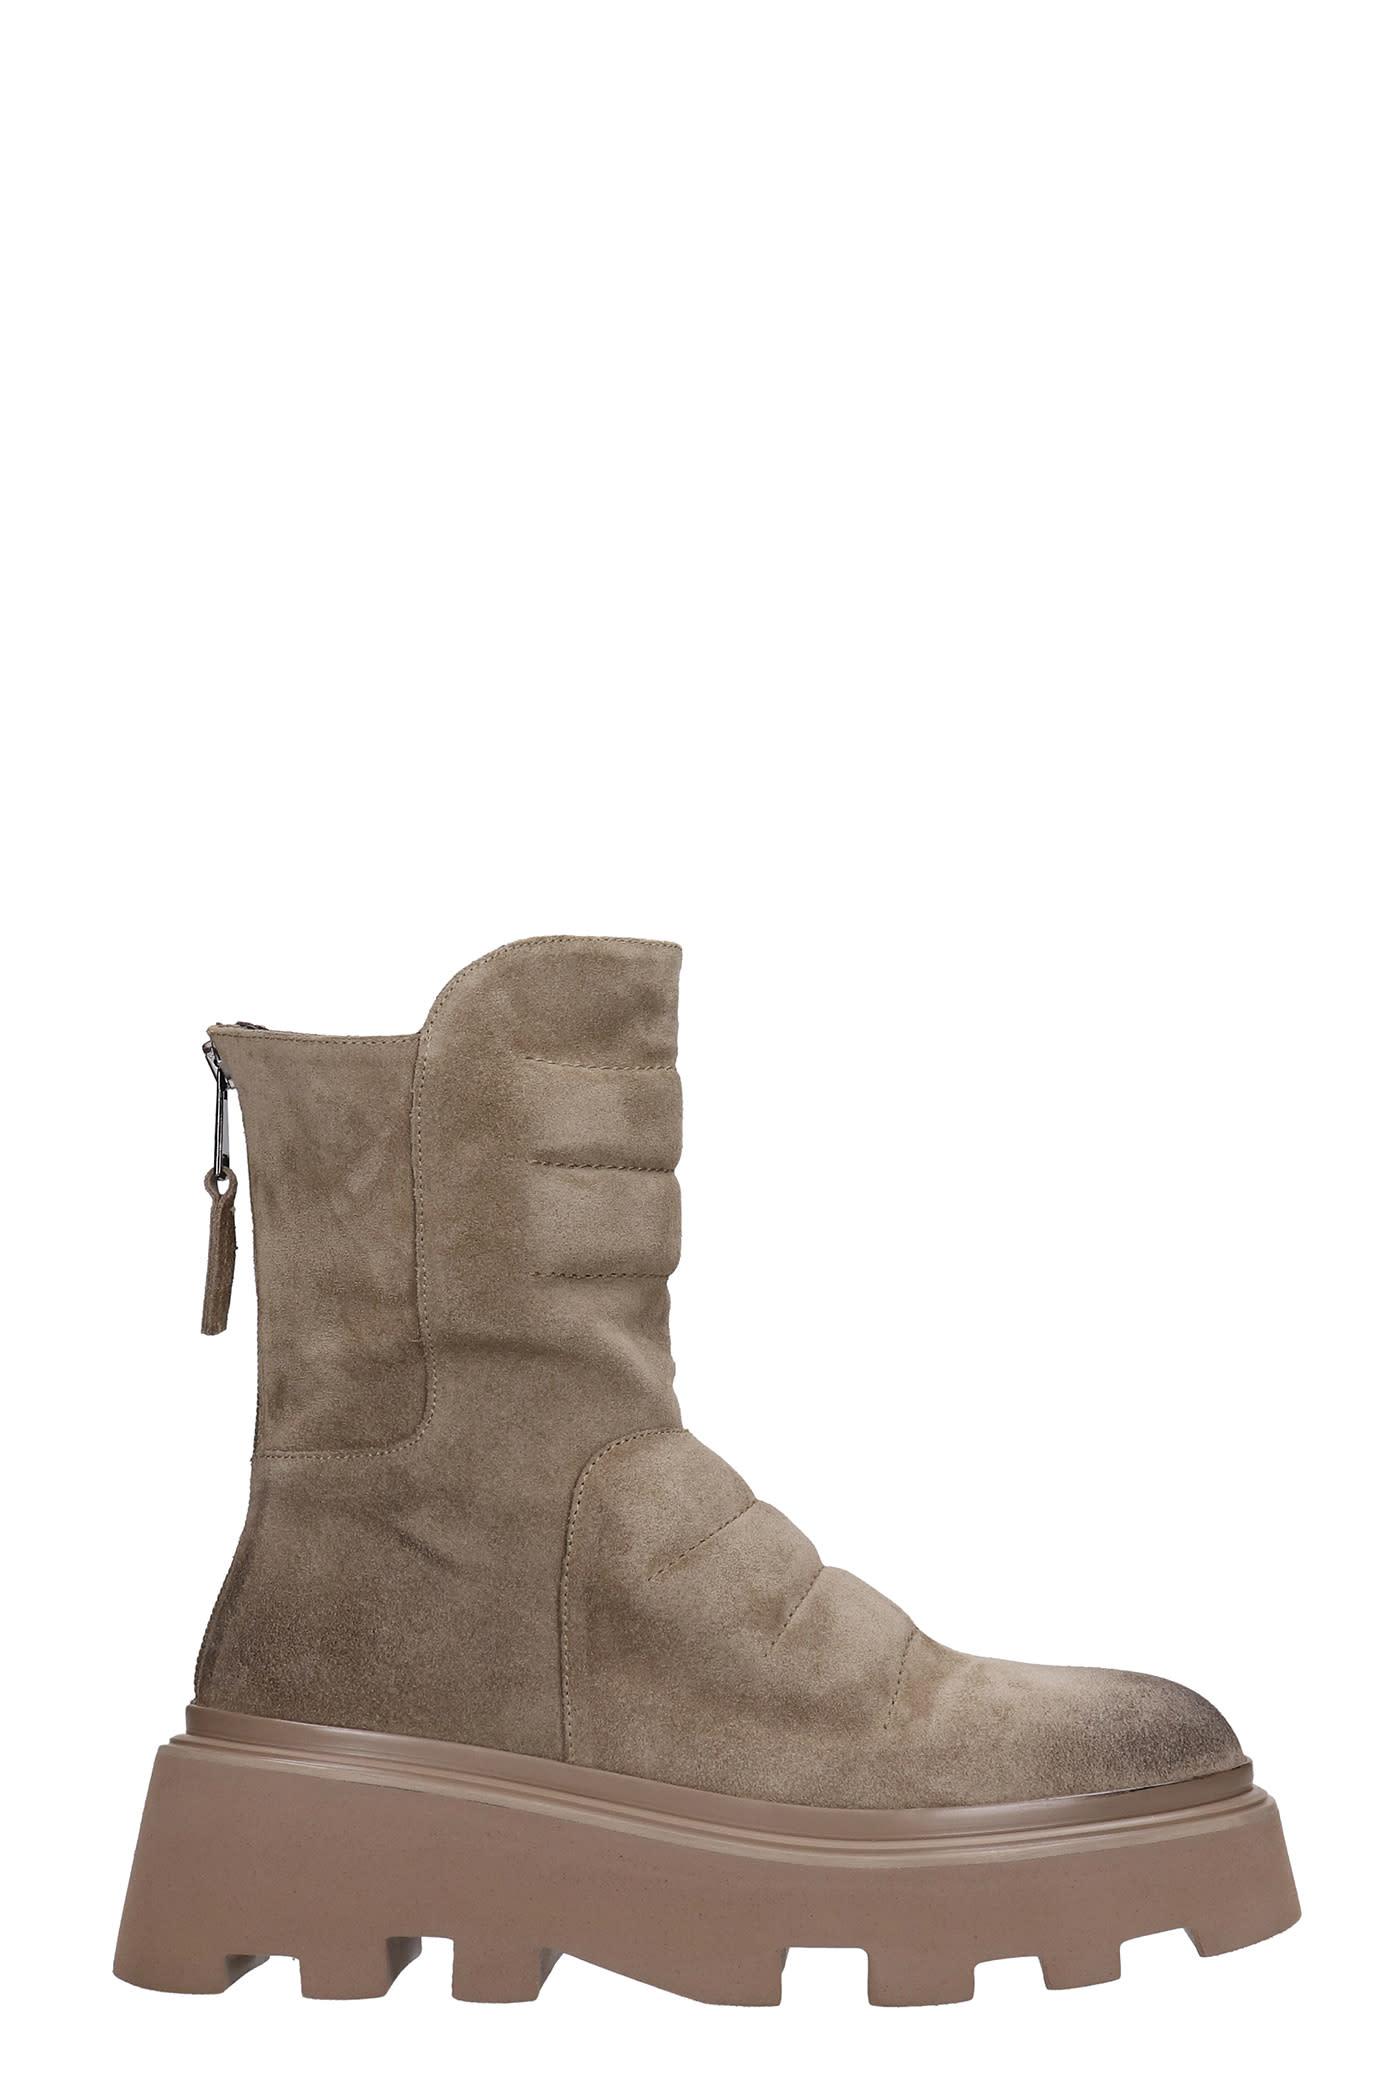 Low Heels Ankle Boots In Beige Suede